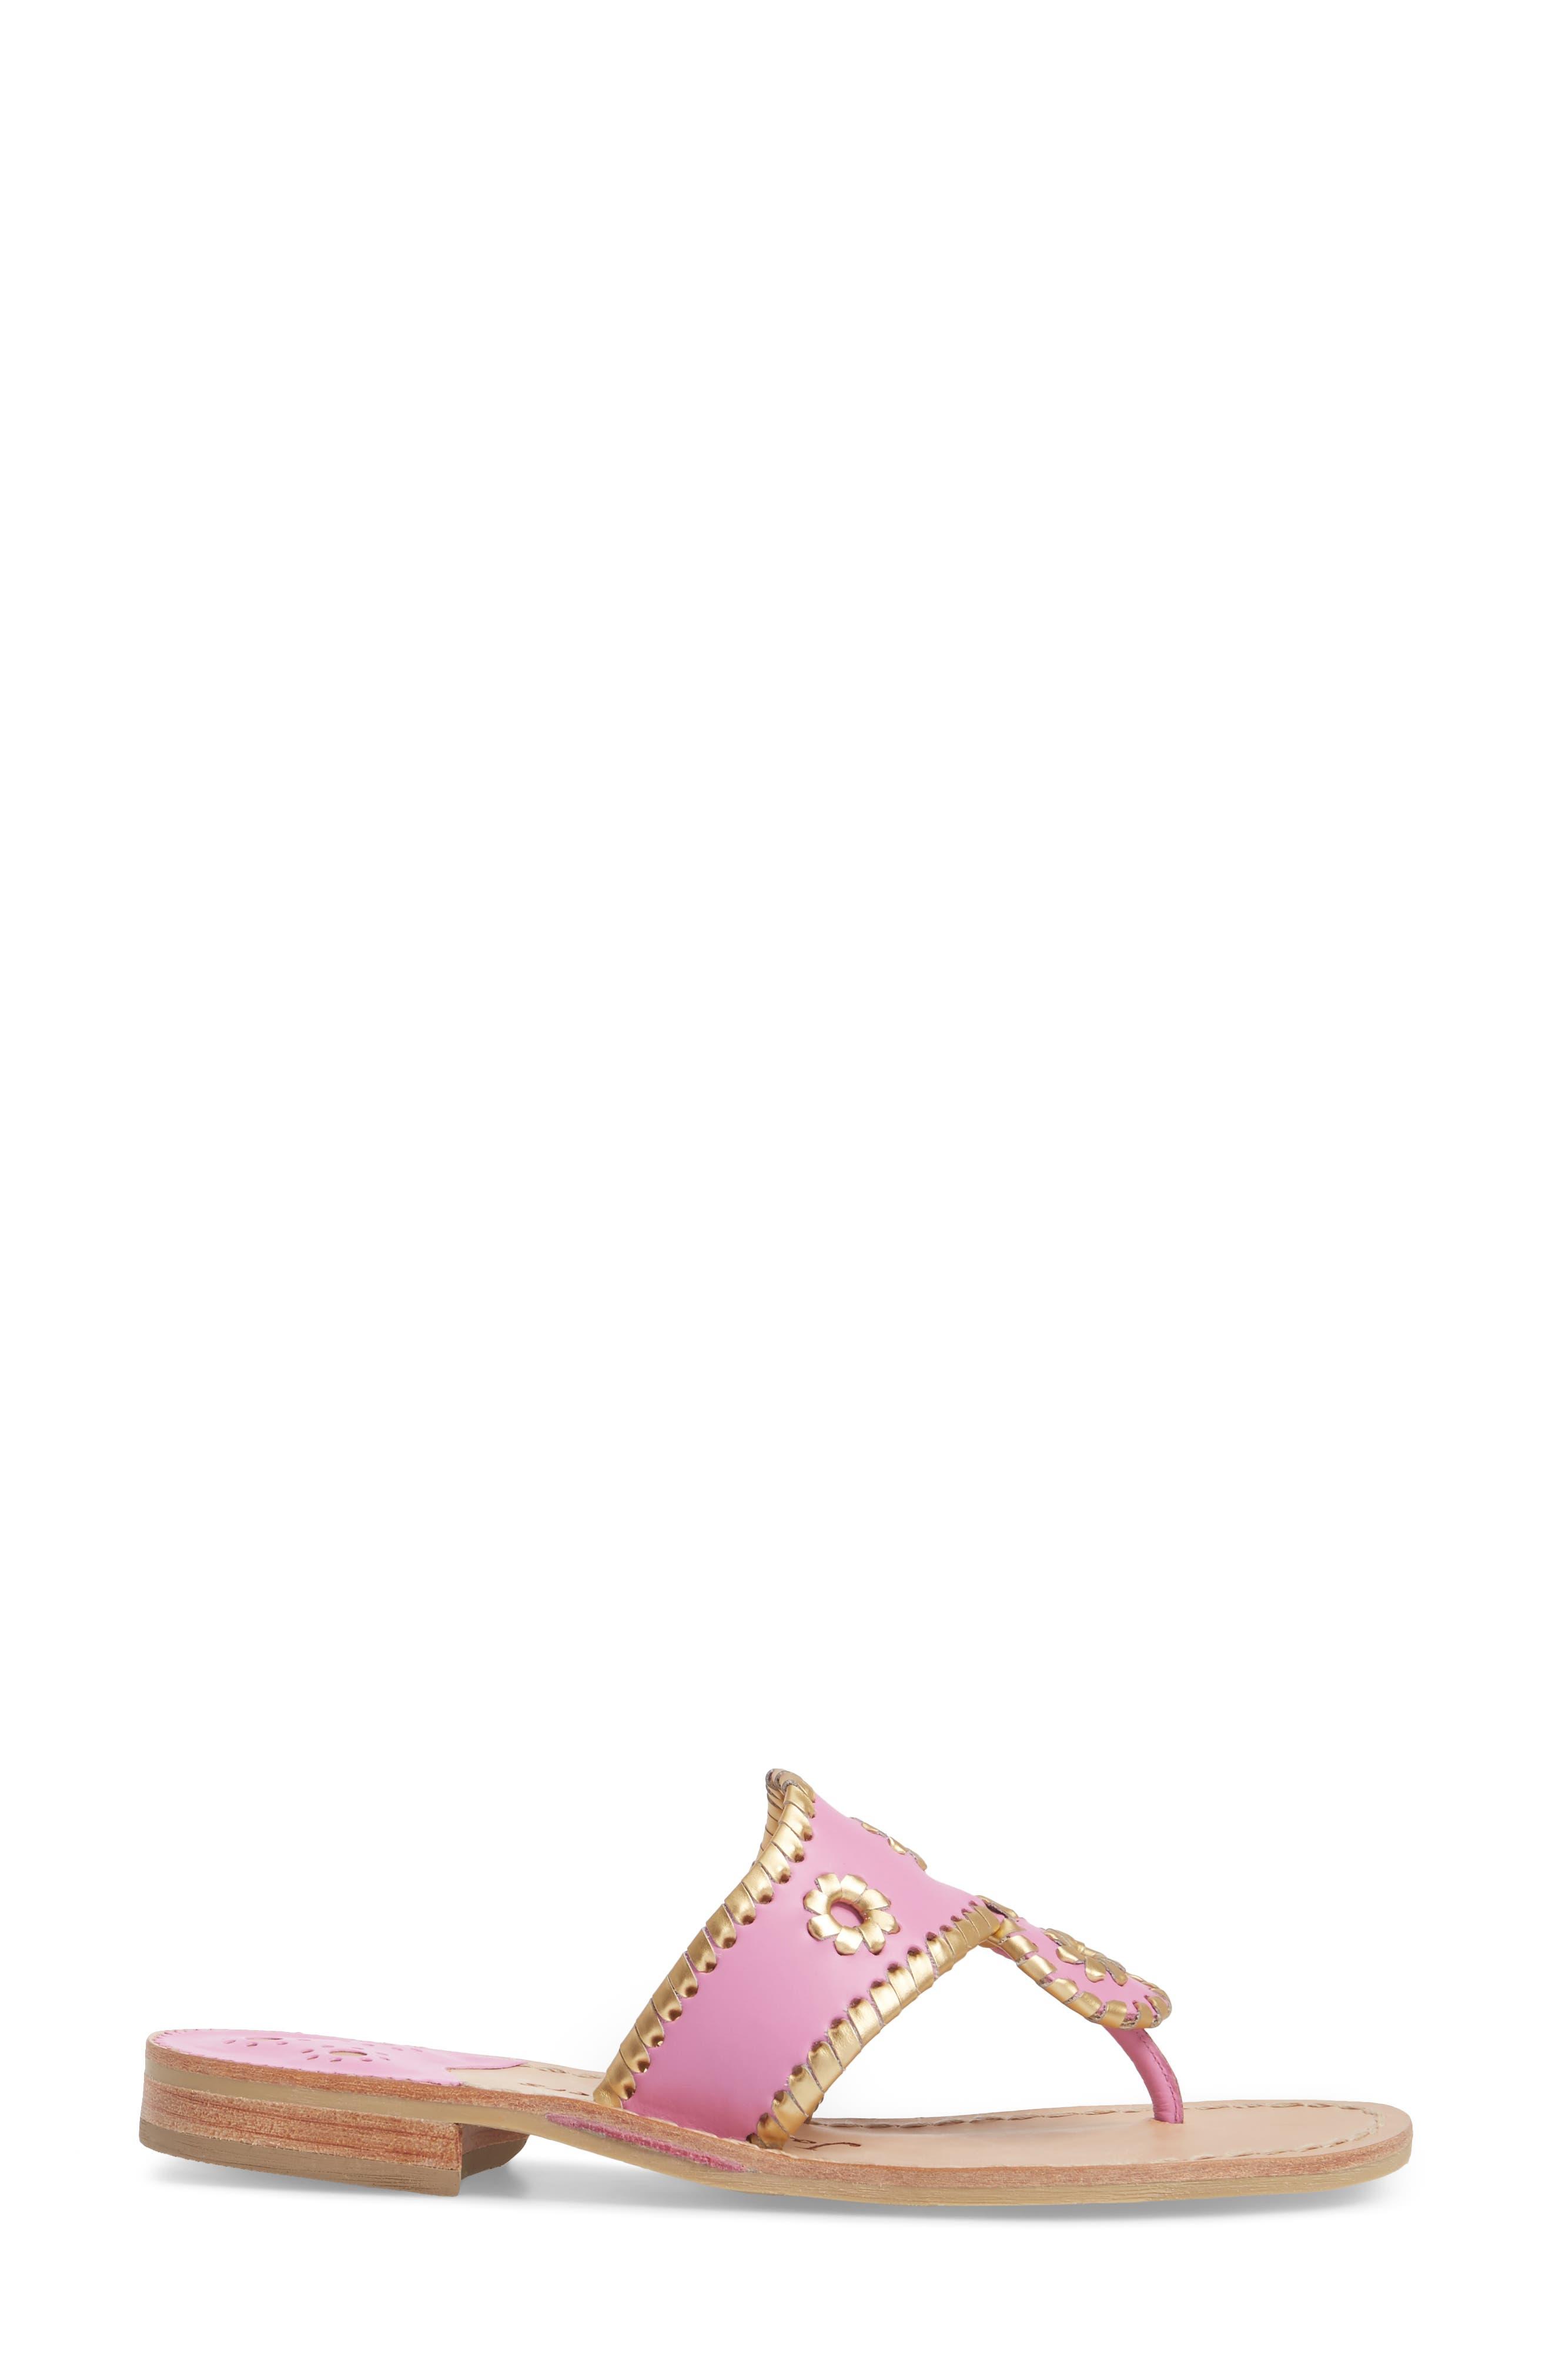 Alternate Image 3  - Jack Rogers Hollis Flat Sandal (Women)